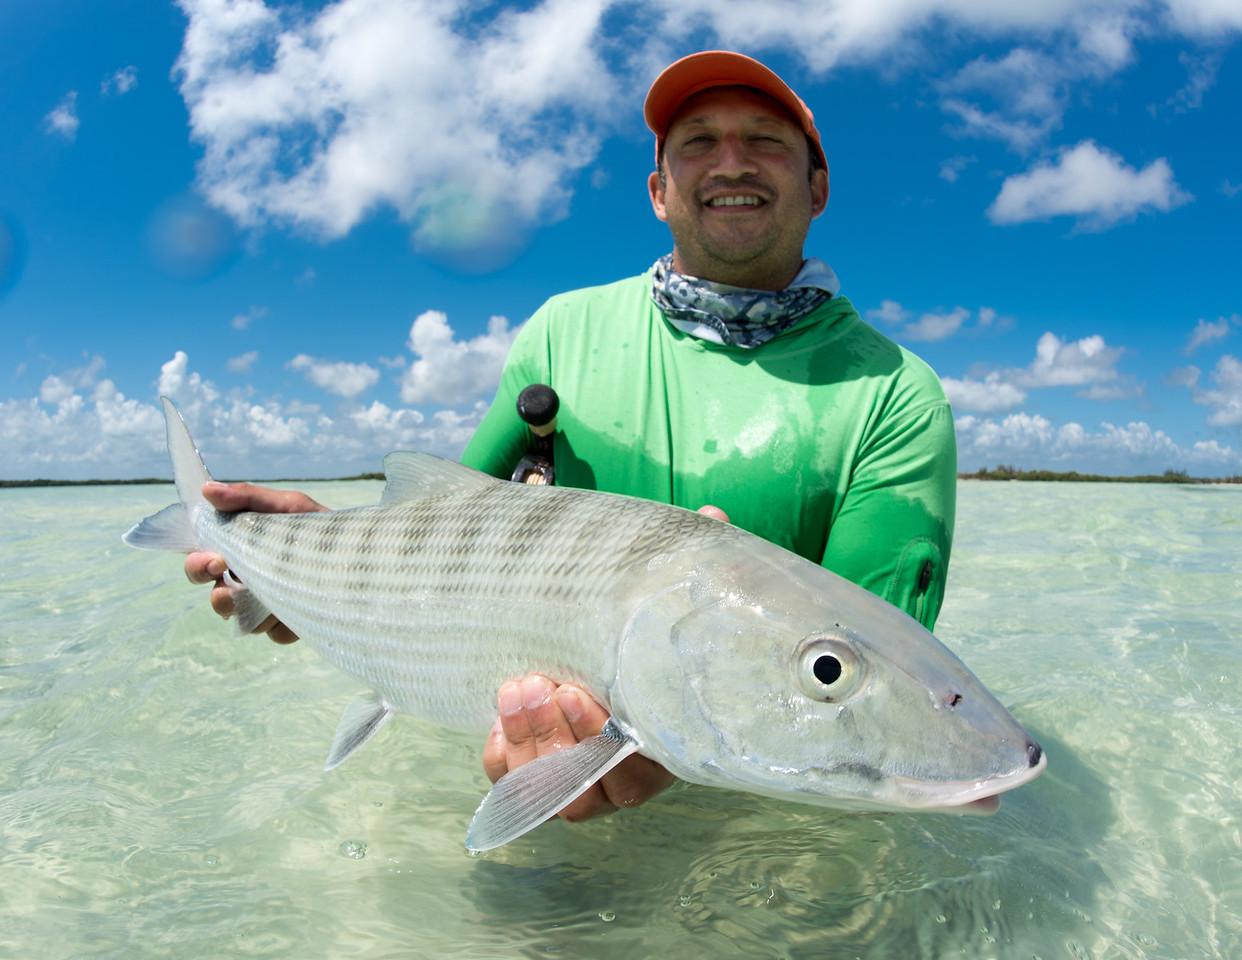 Fly fishing Cayo Cruz and Cayo Romano, Cuba aboard the Avalon I Mothership. Avalon Fly Fishing and Yellow Dog Flyfishing Adventures - CUBA.  (c) Jim Klug Outdoor Photos